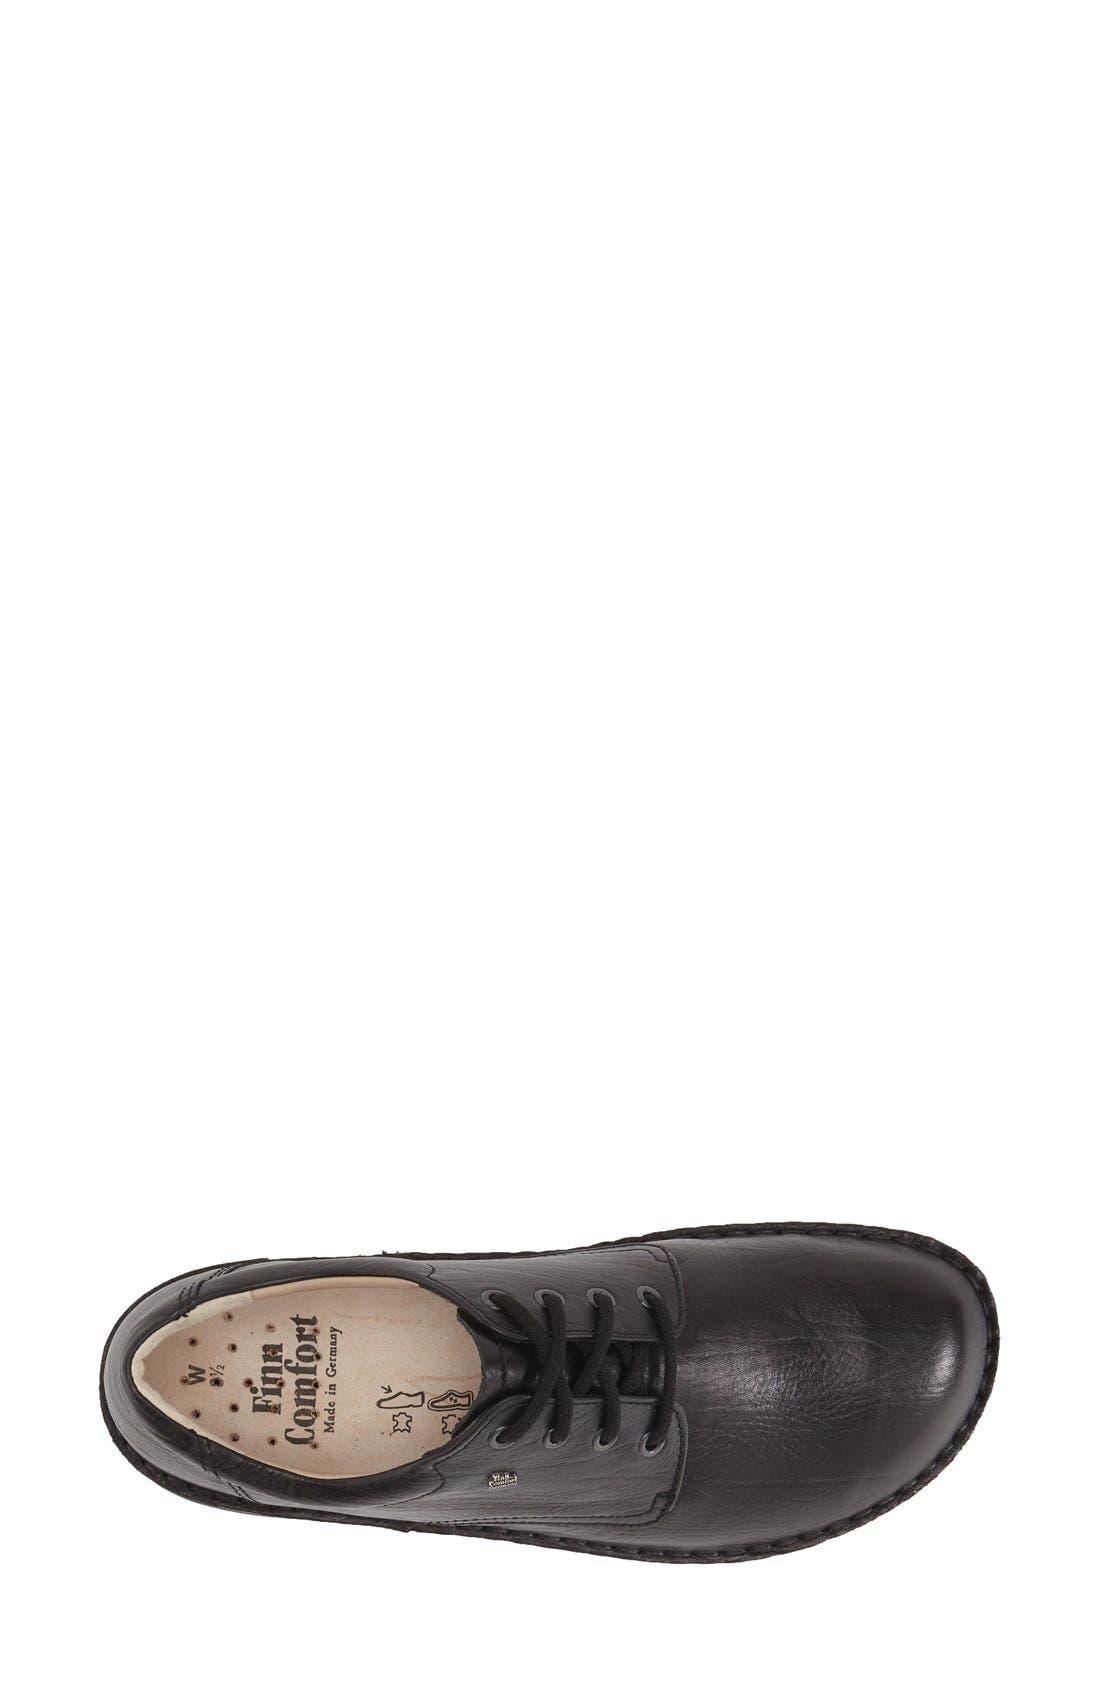 'Metz' Oxford,                             Alternate thumbnail 3, color,                             Black Leather